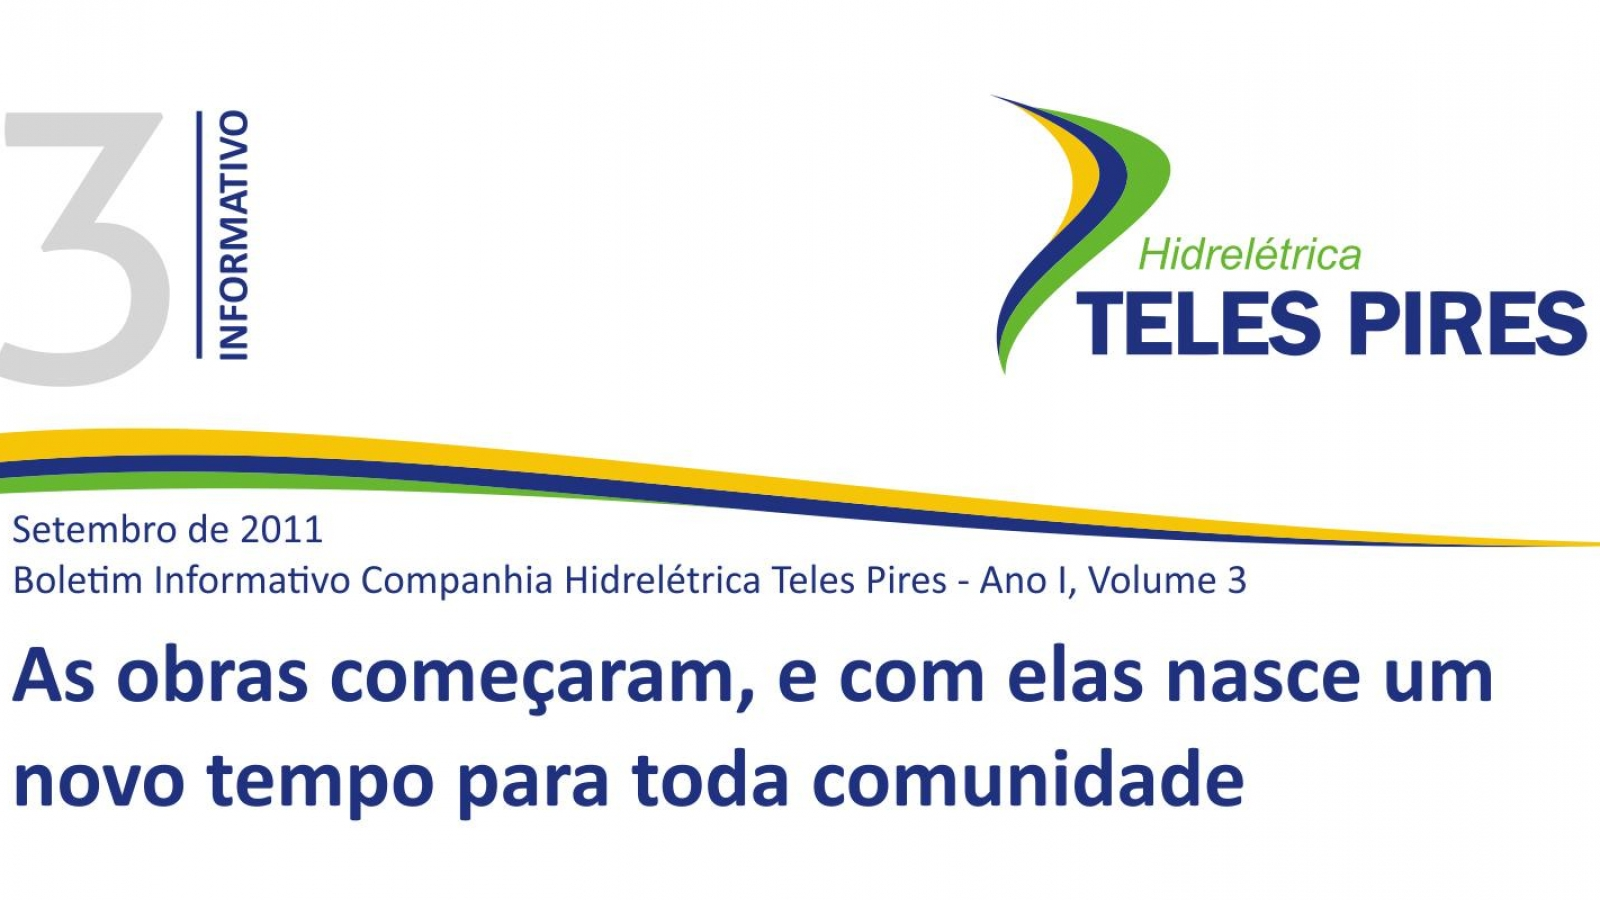 Boletim Informativo Companhia Hidrelétrica Teles Pires - Volume 3